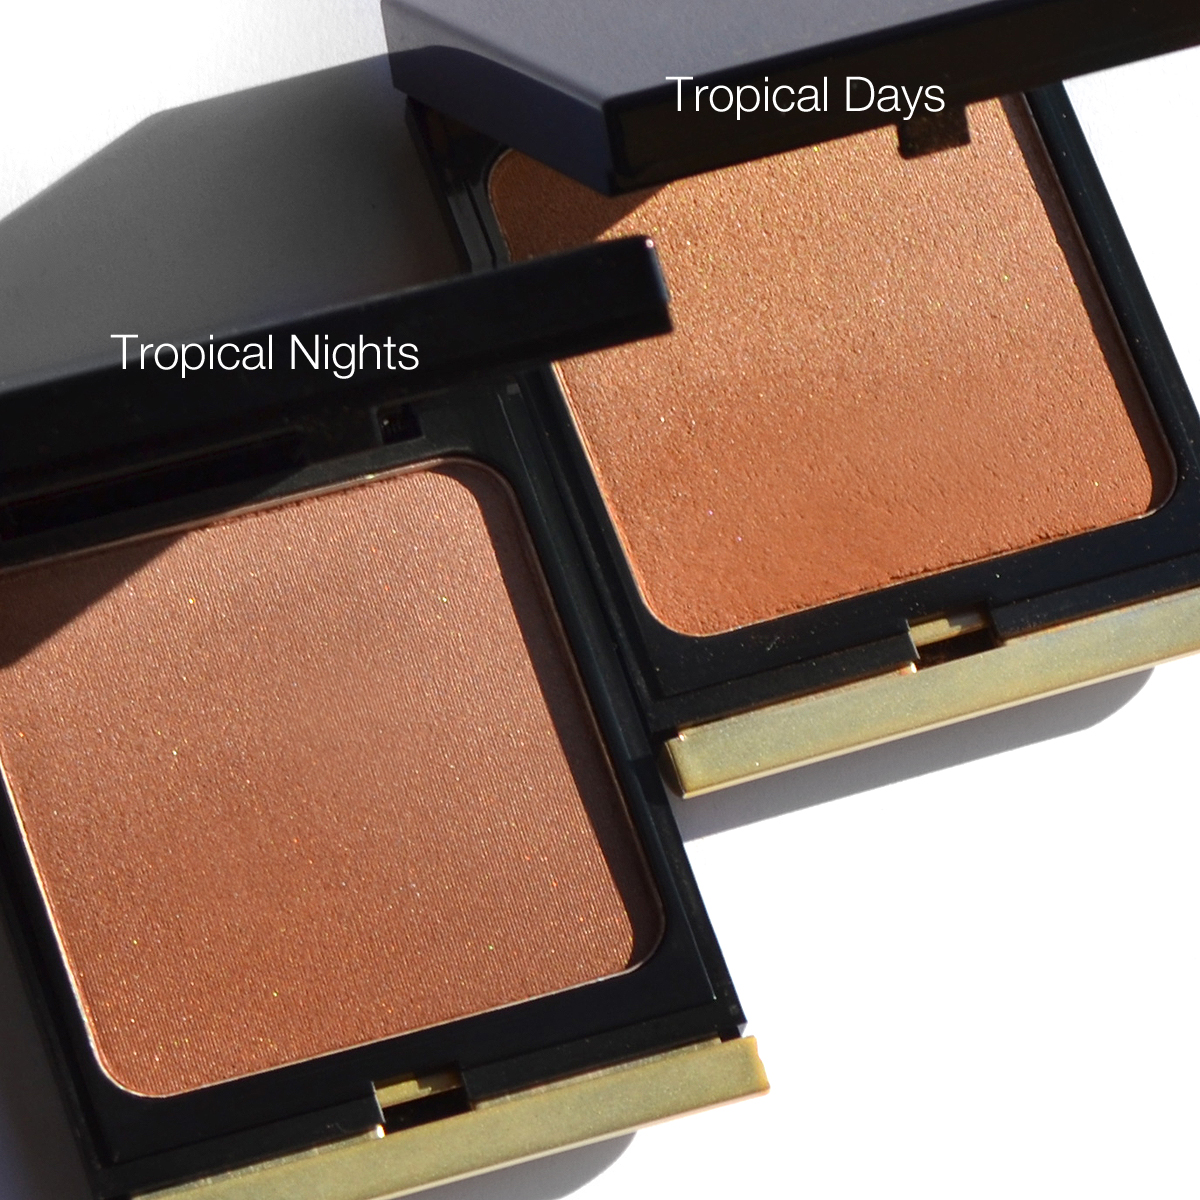 Kevyn Aucoin Celestial Bronzing Veil Beauty Buys Bronzing Beauty Makeup